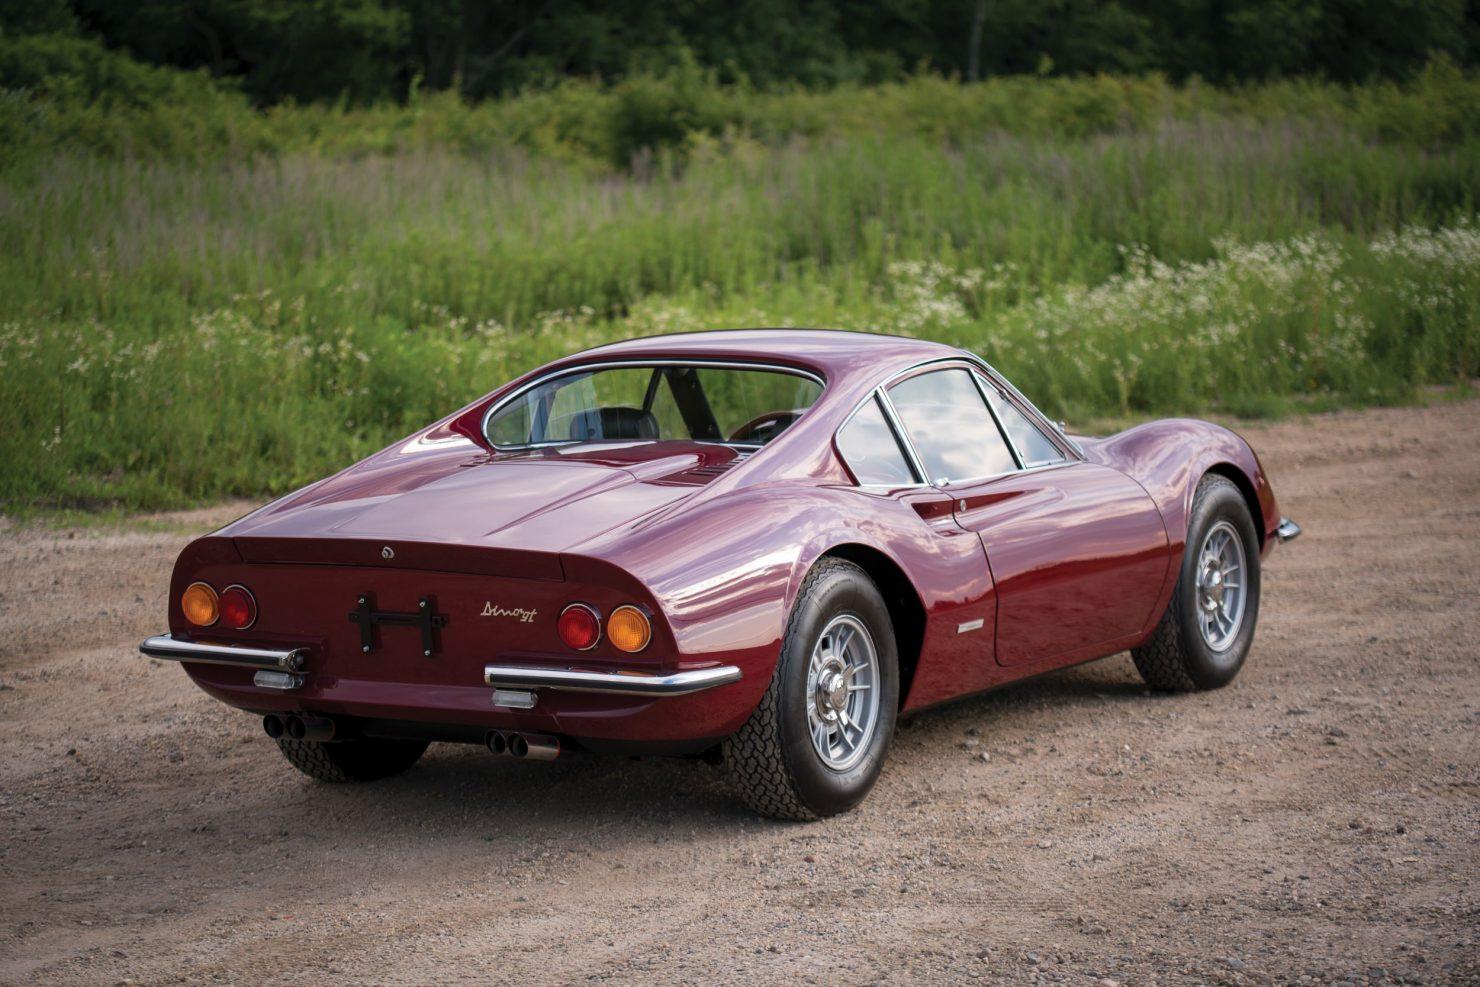 ferrari dino 246 2 1480x987 - 1969 Ferrari Dino 246 GT